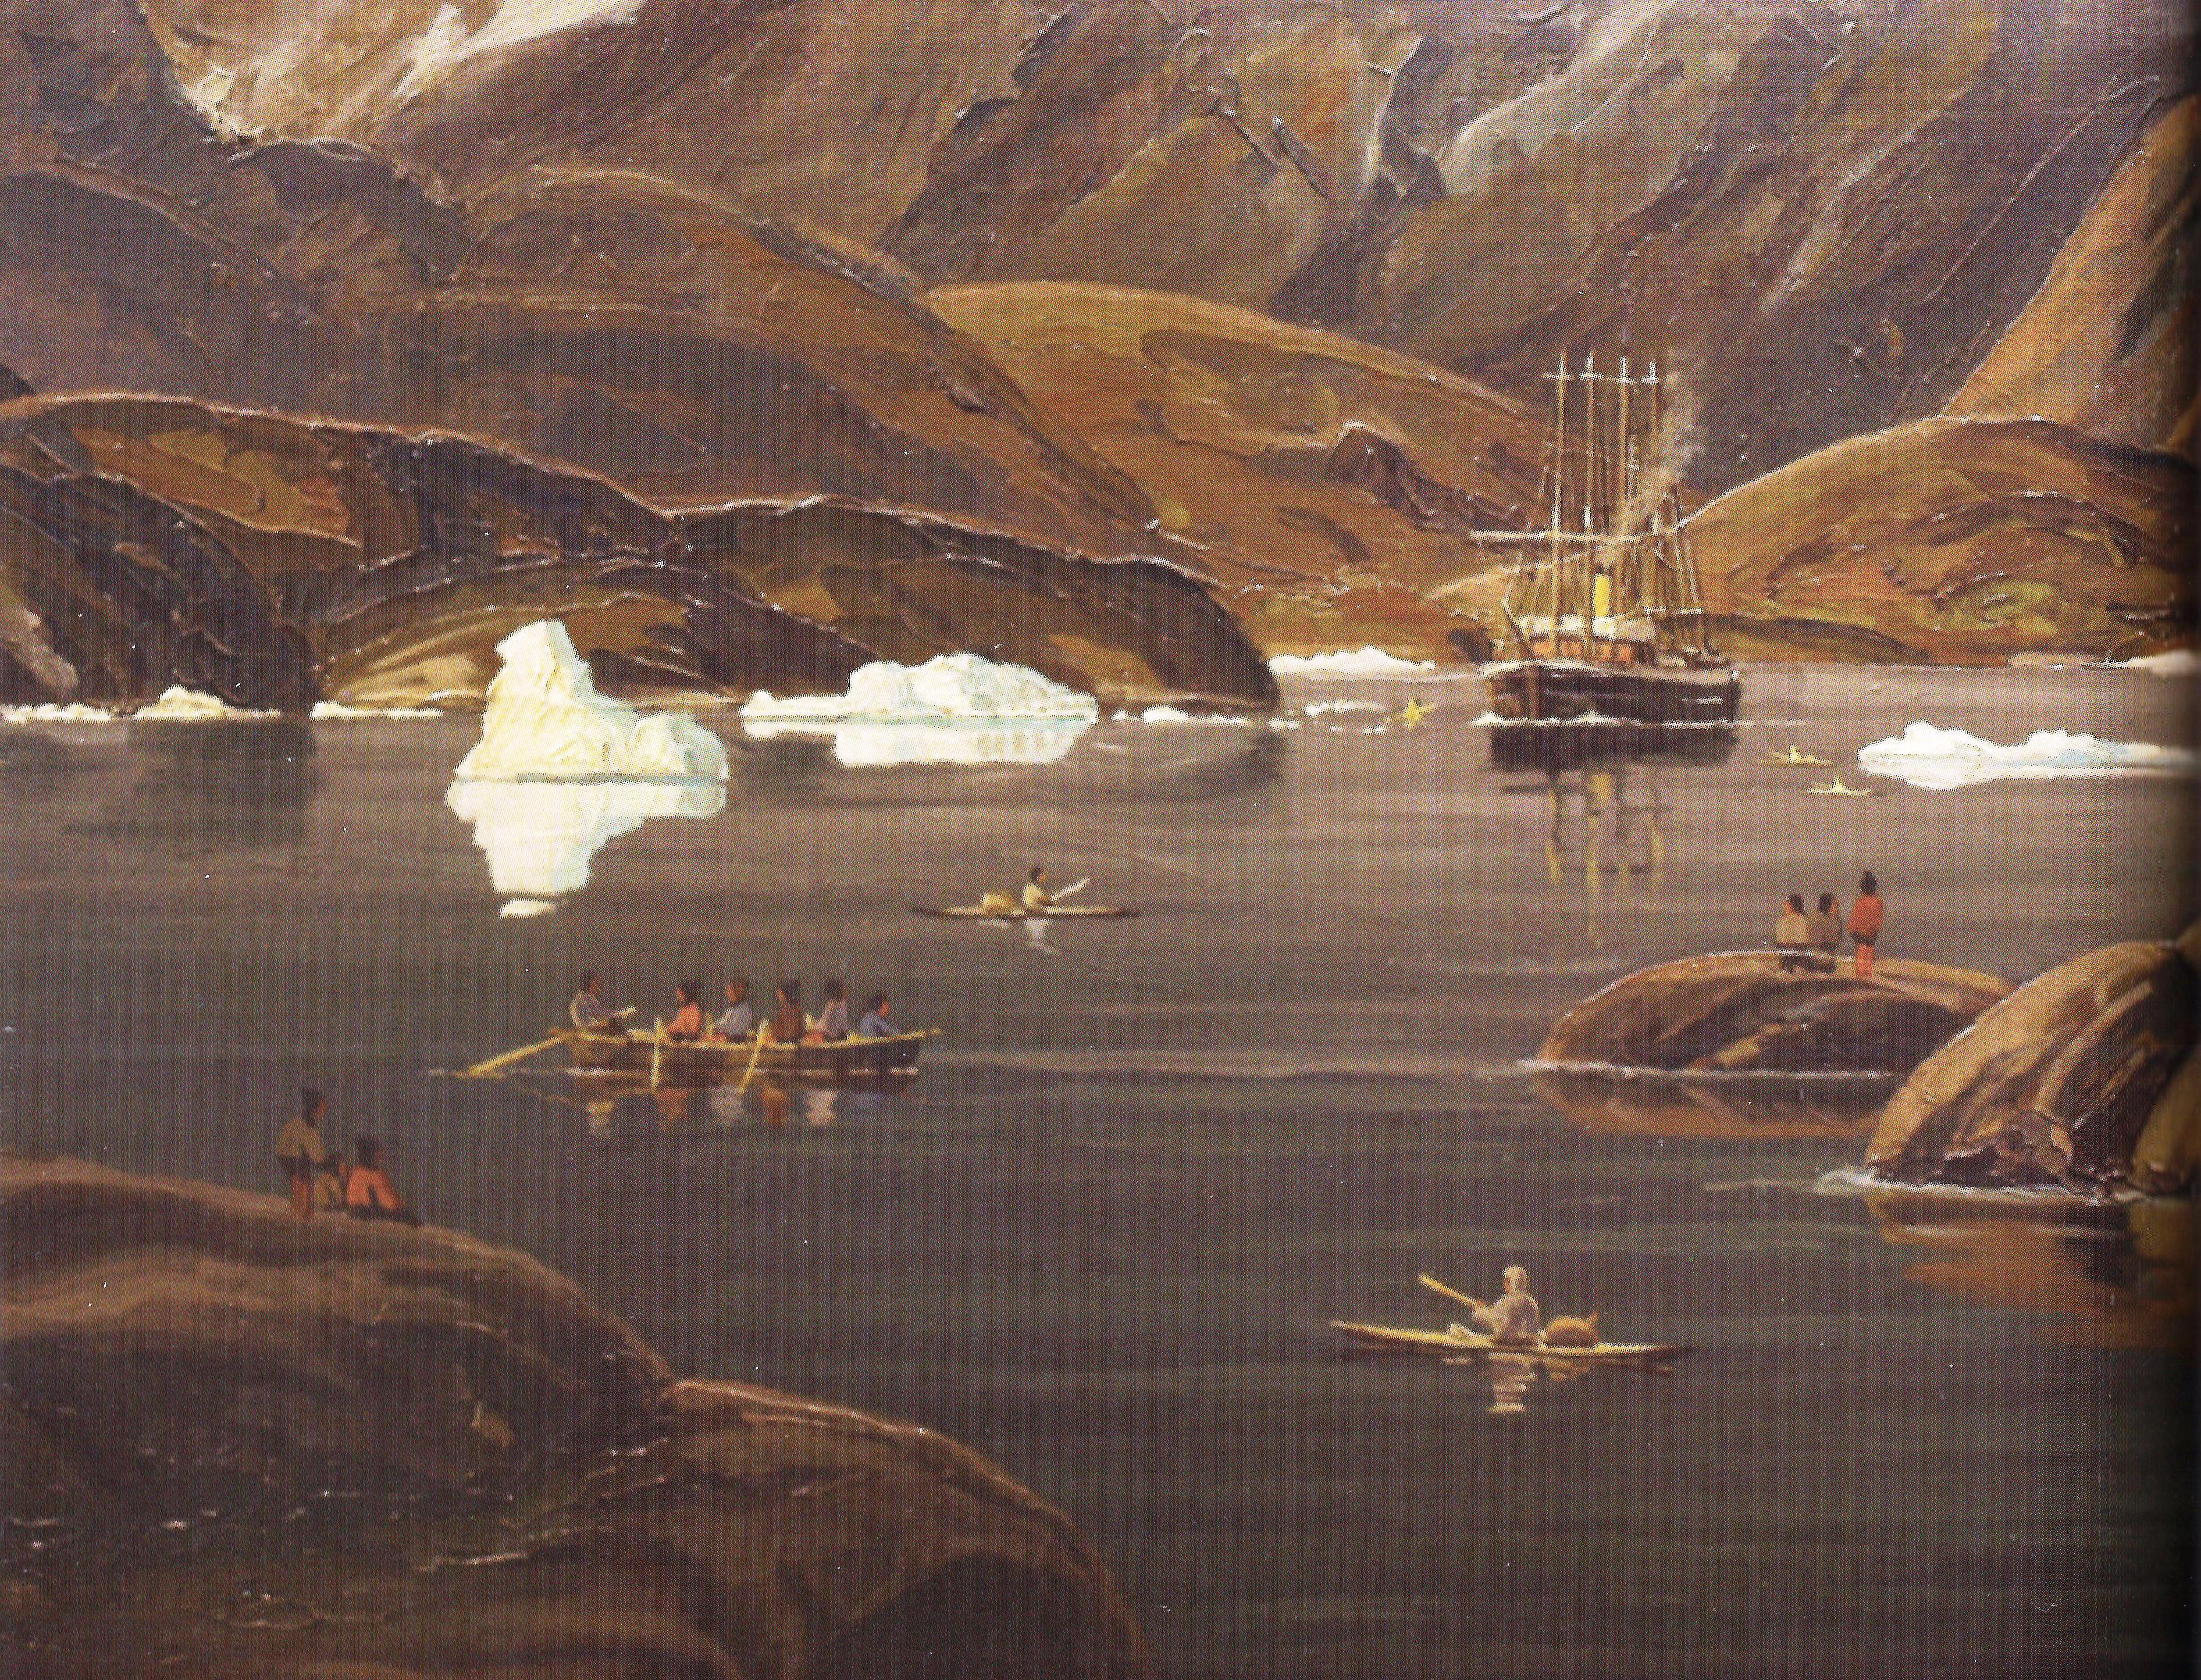 inuit 007 (Domínguez-Solera 2014 - 36)